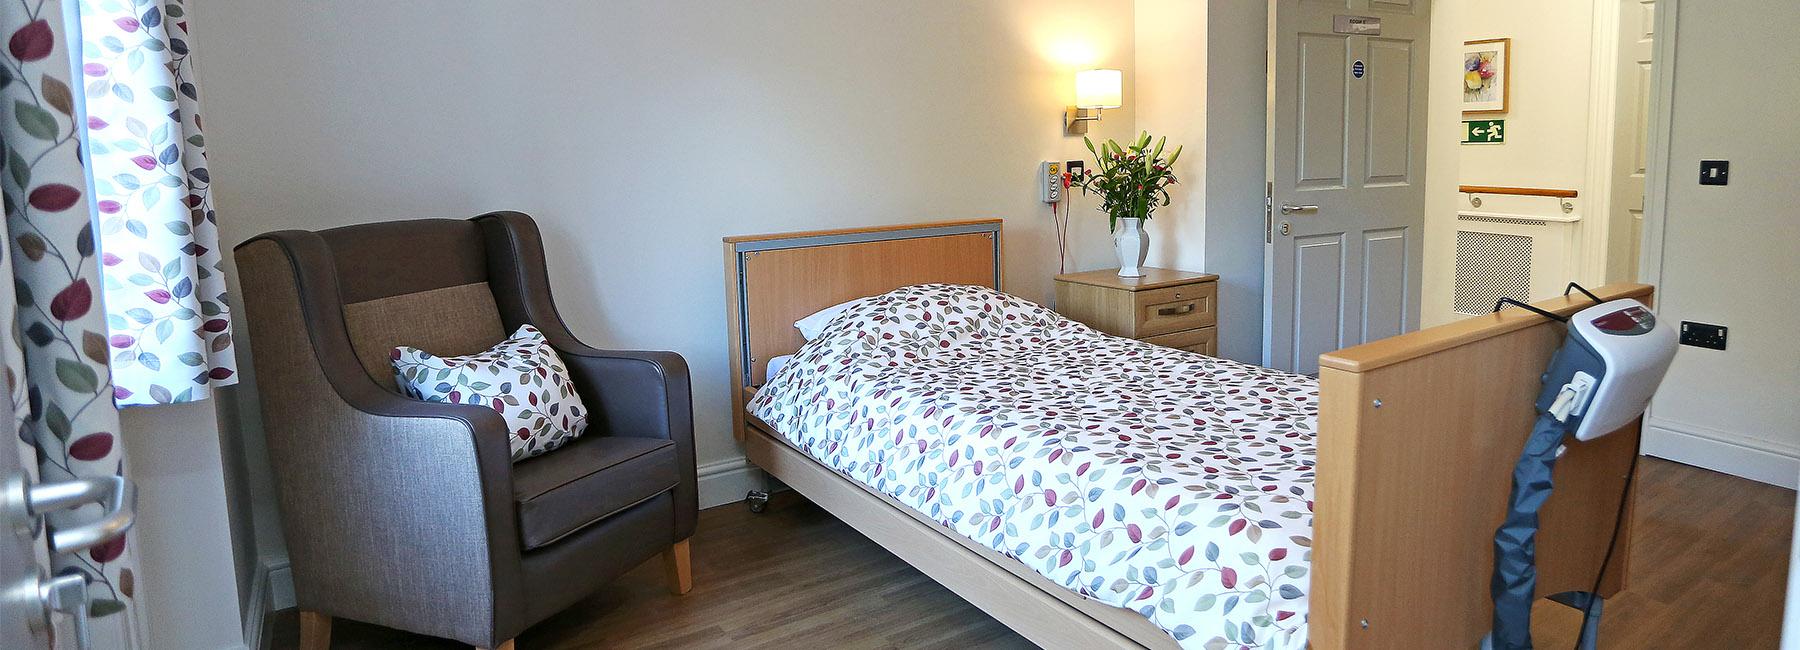 Newly refurbished bedrooms Danbury Essex